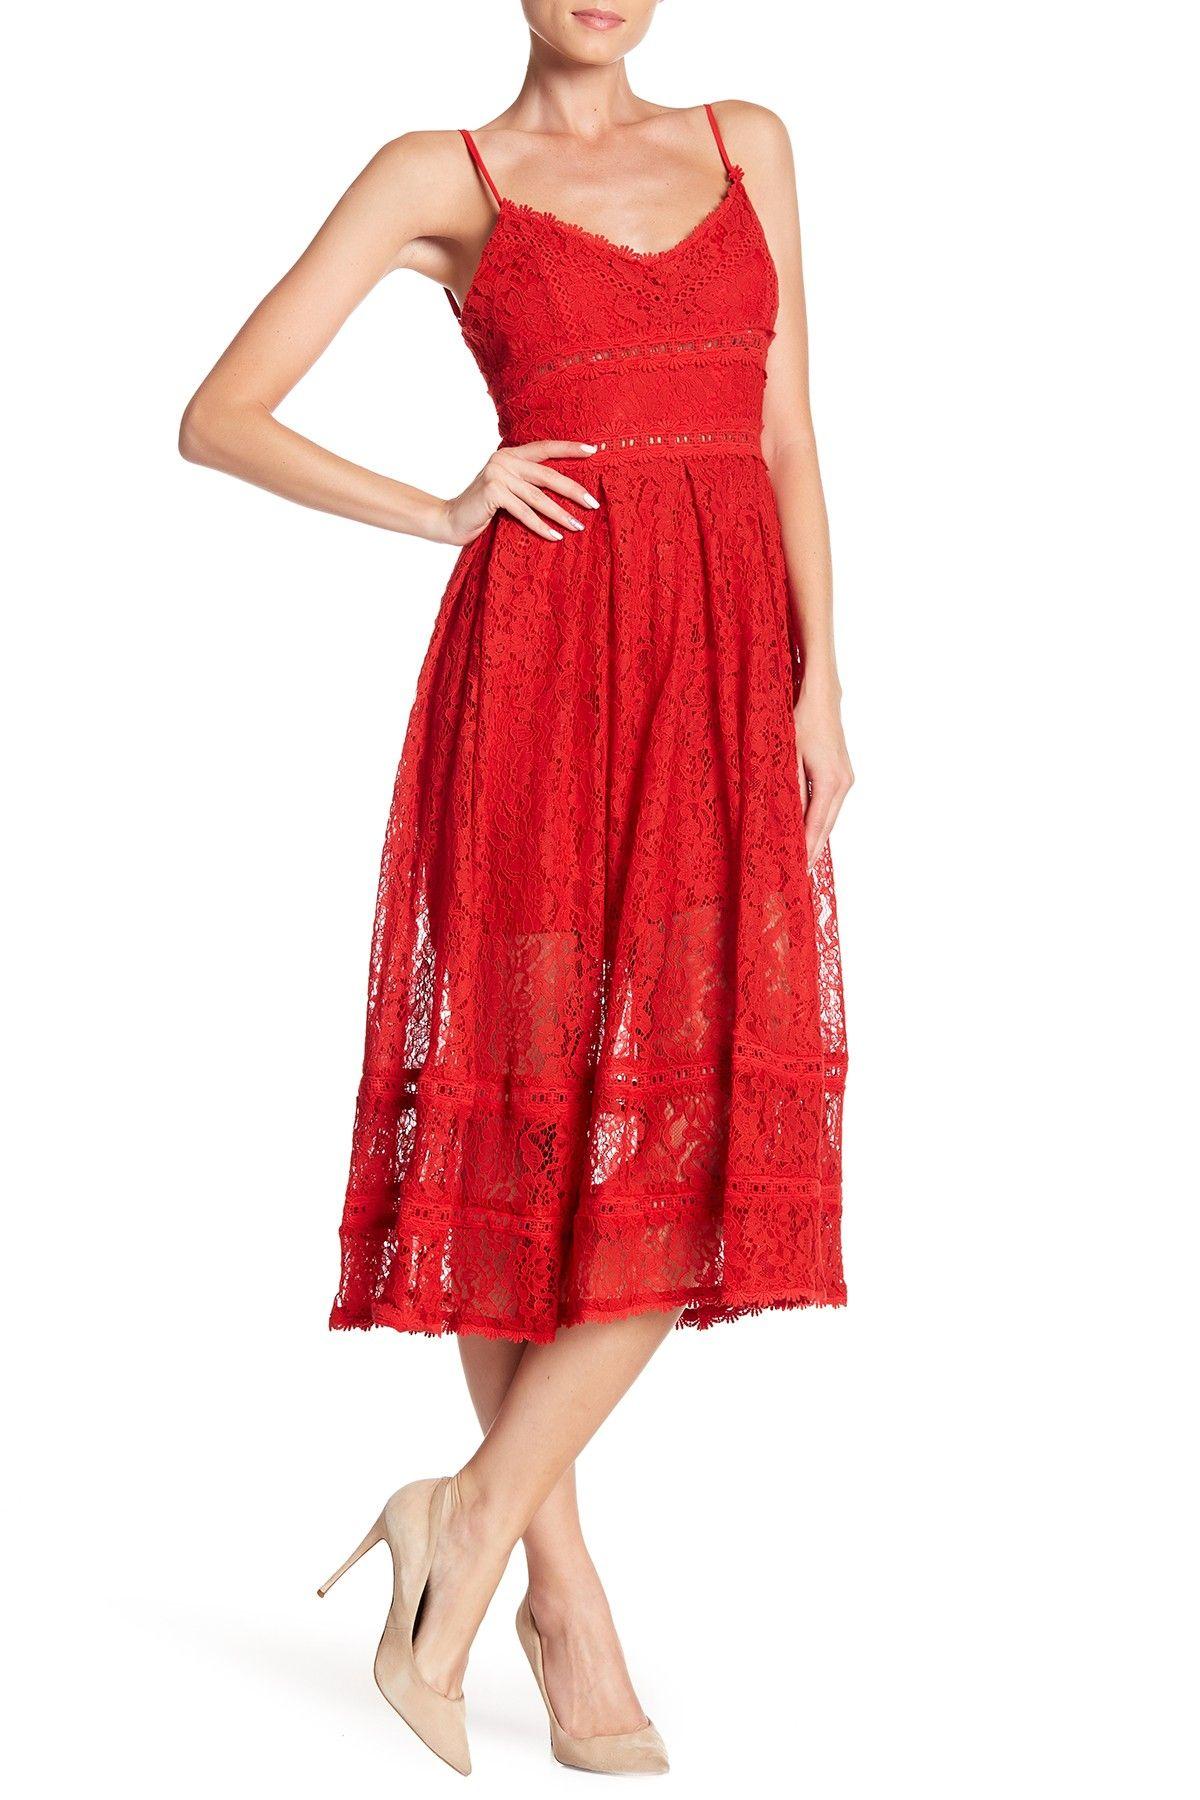 Nsr Sleeveless Lace Midi Dress Nordstrom Rack Red Midi Dress Lace Midi Dress Midi Dress [ 1800 x 1200 Pixel ]